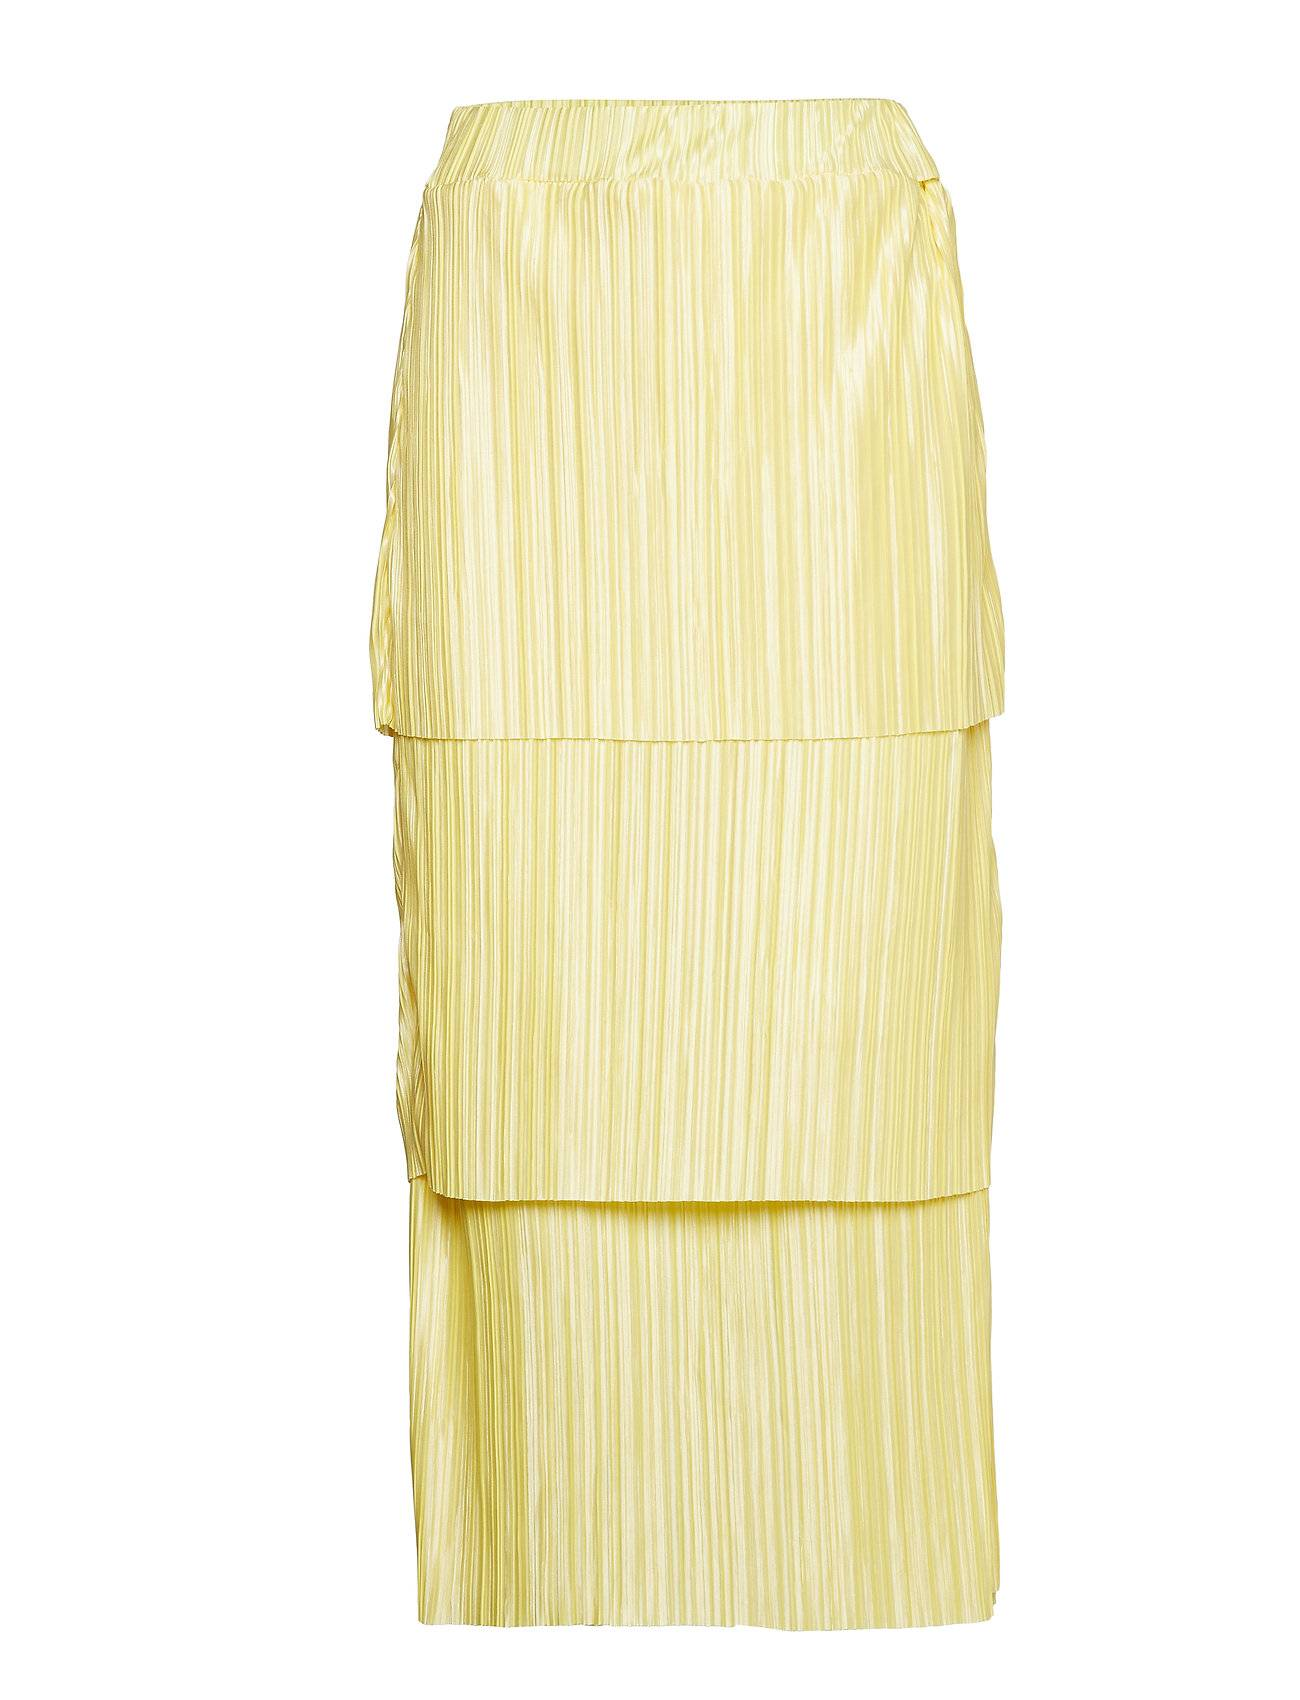 Gina Tricot Meja Pleated Skirt Polvipituinen Hame Keltainen Gina Tricot